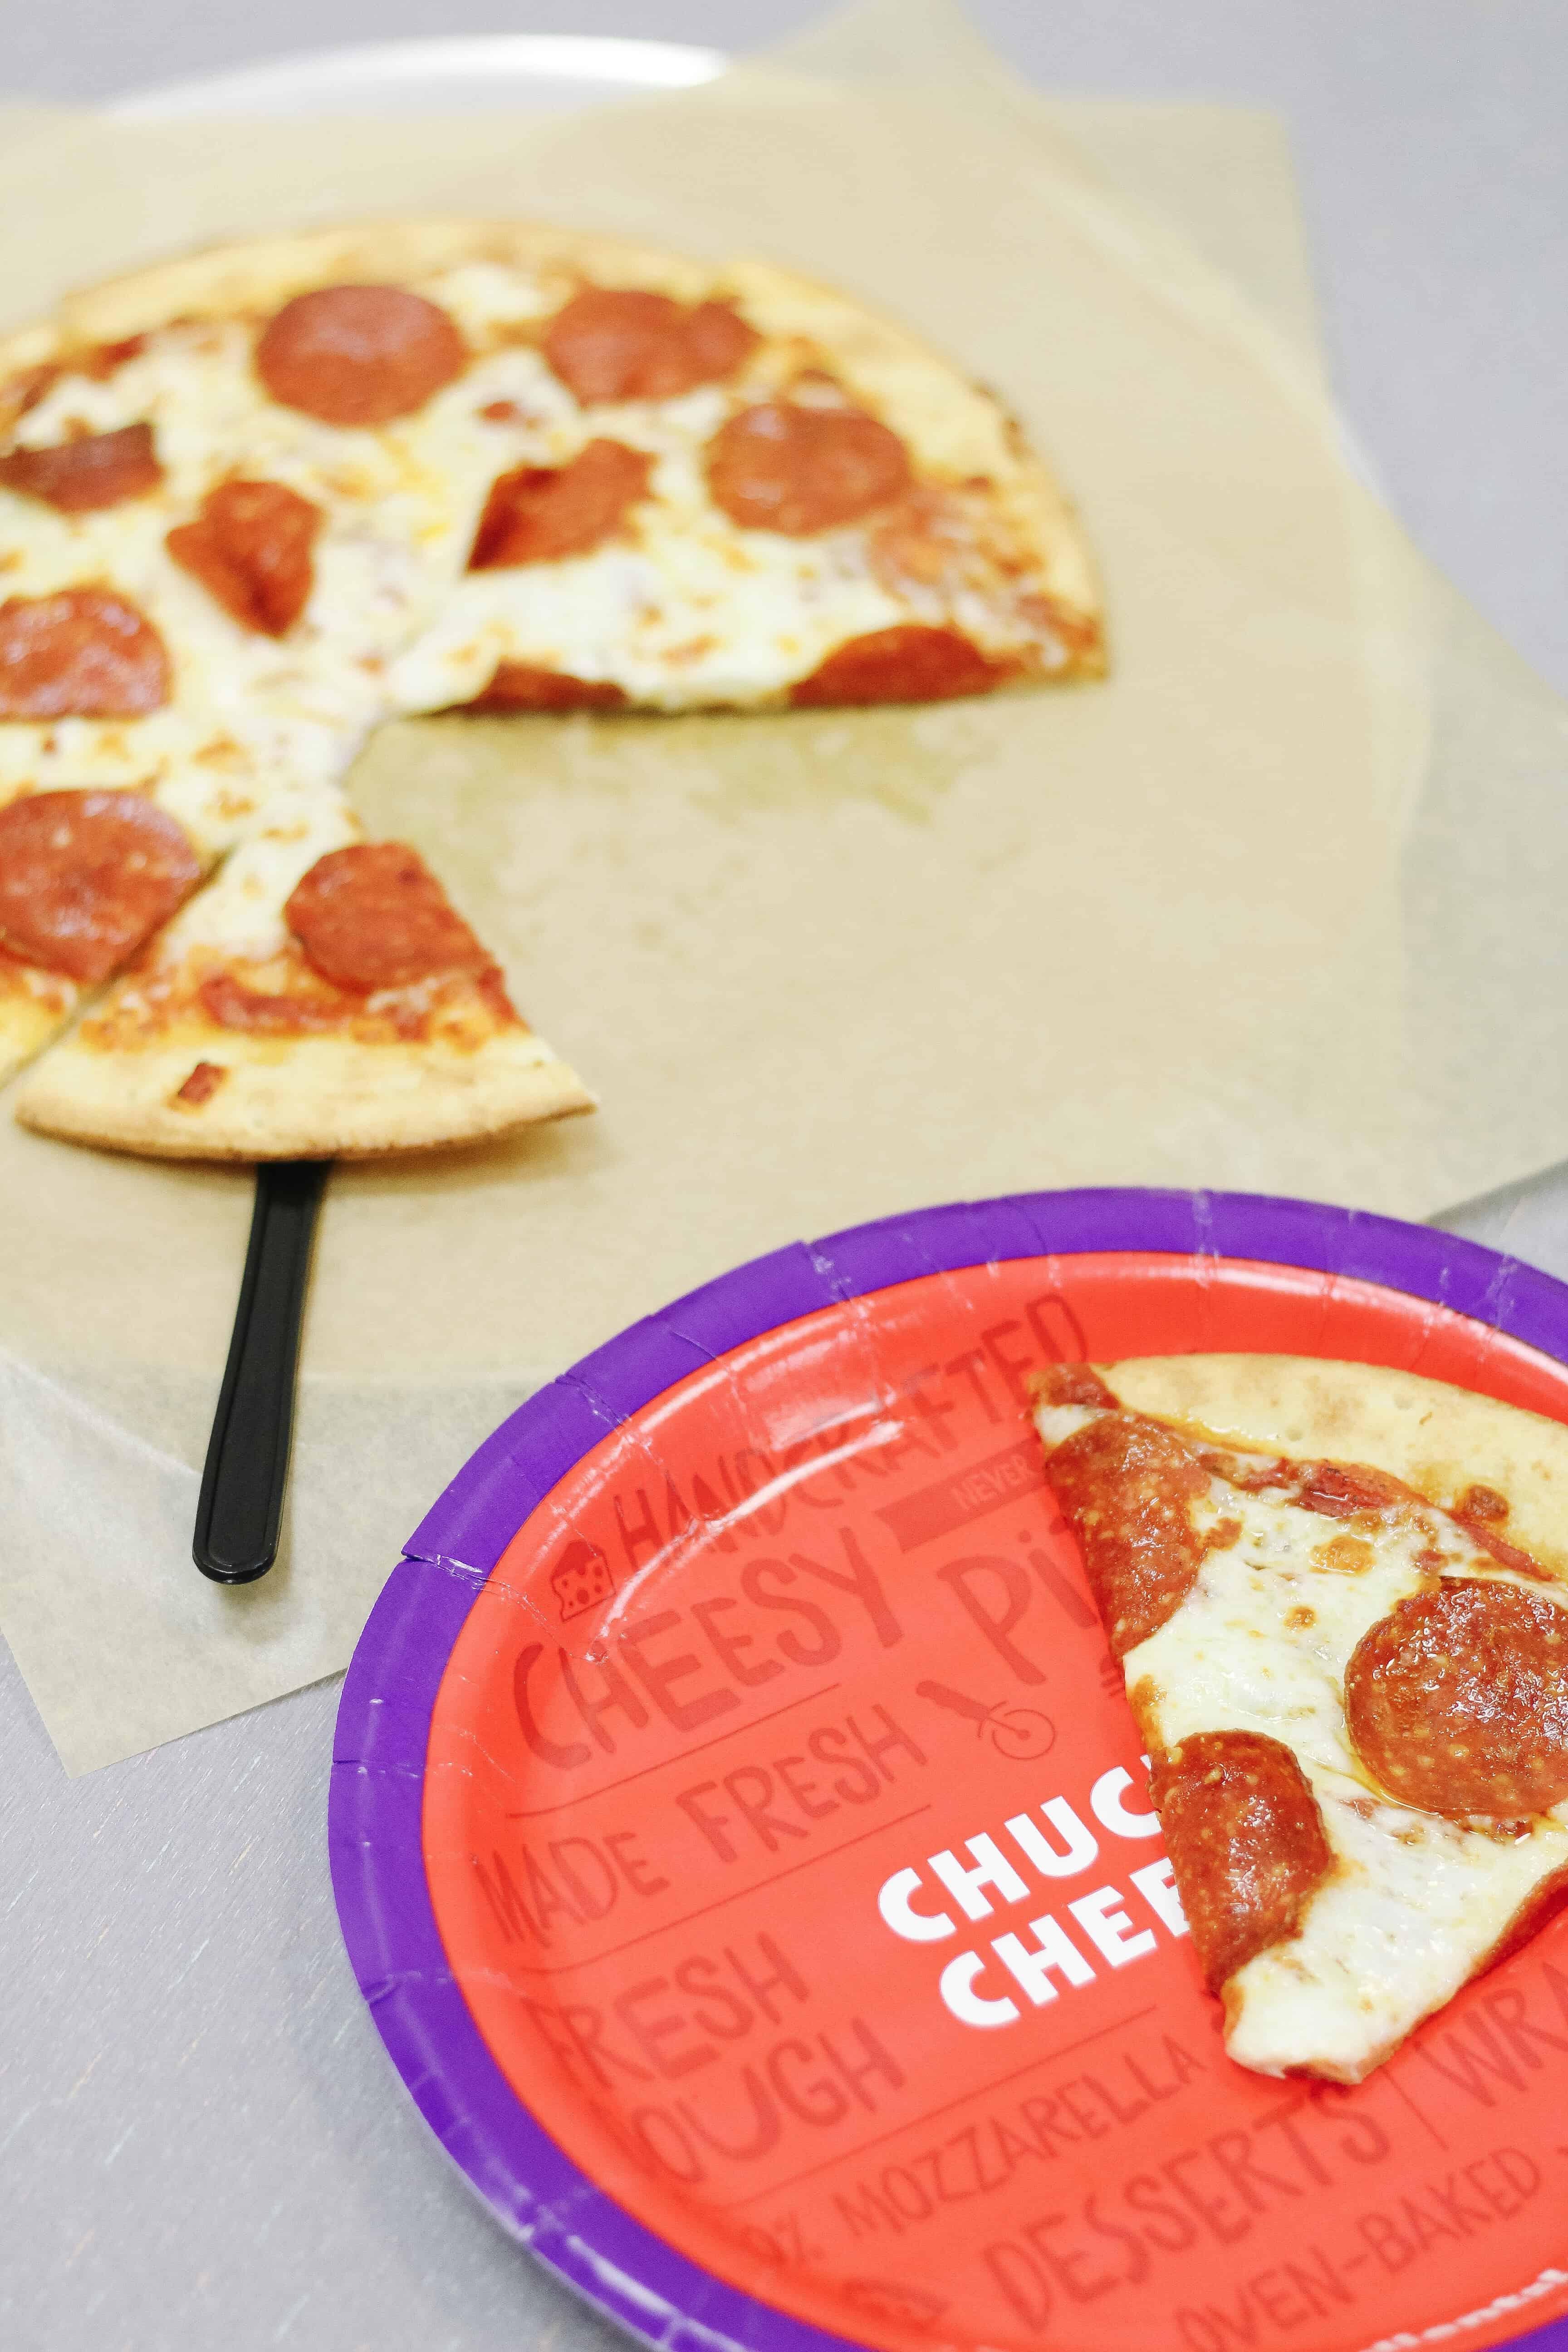 Chuck E. Cheese Caulilflower based crust pizza